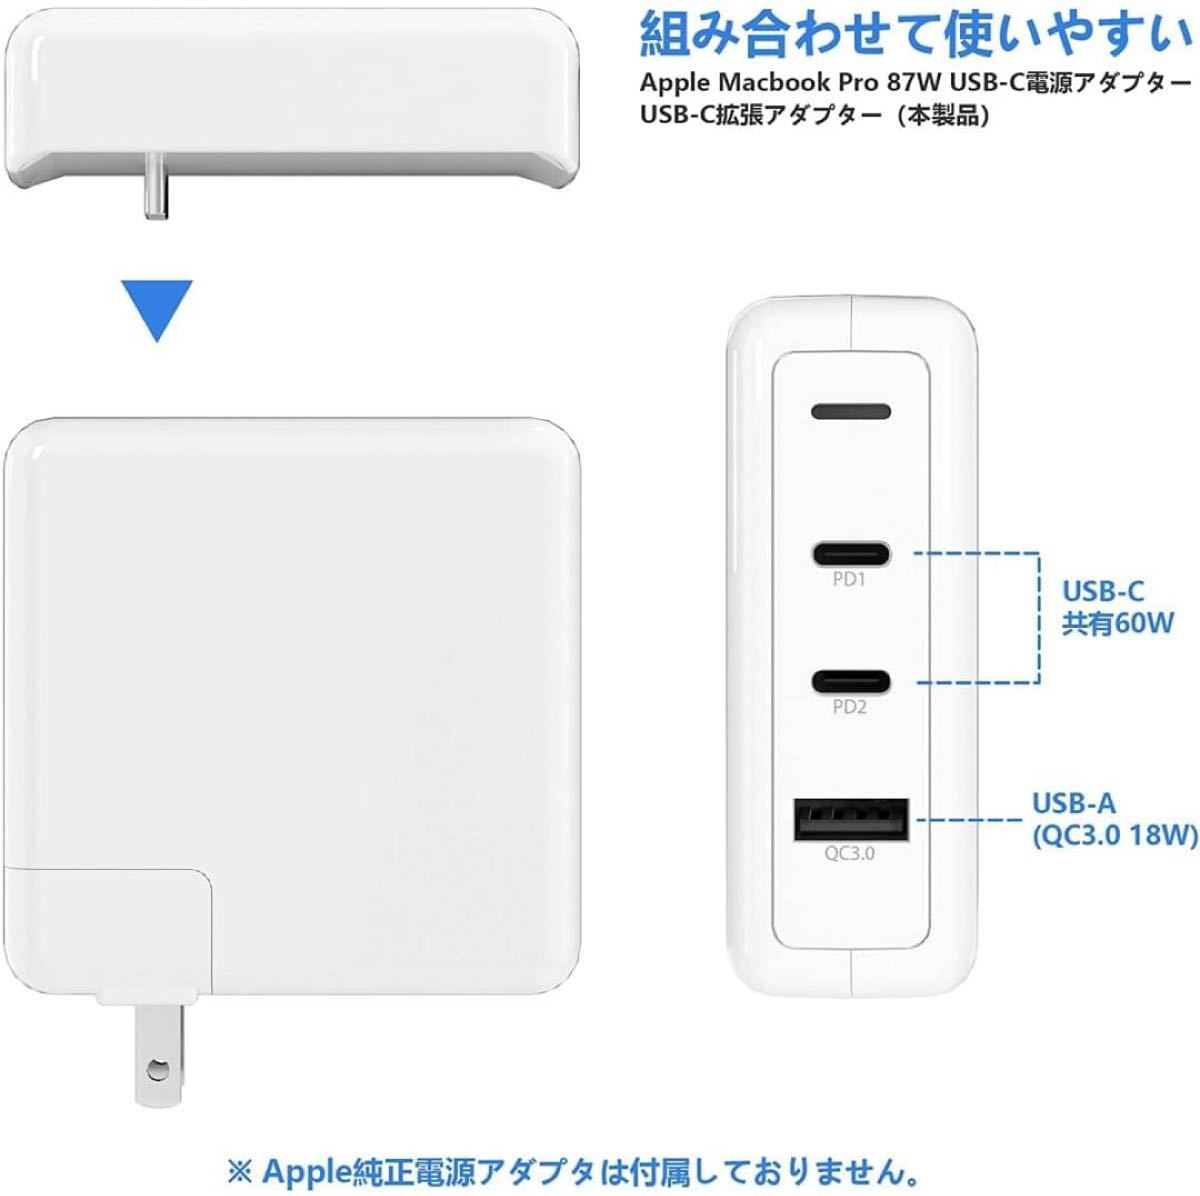 Mac Book Pro 87W USB-C電源アダプター ポータブル